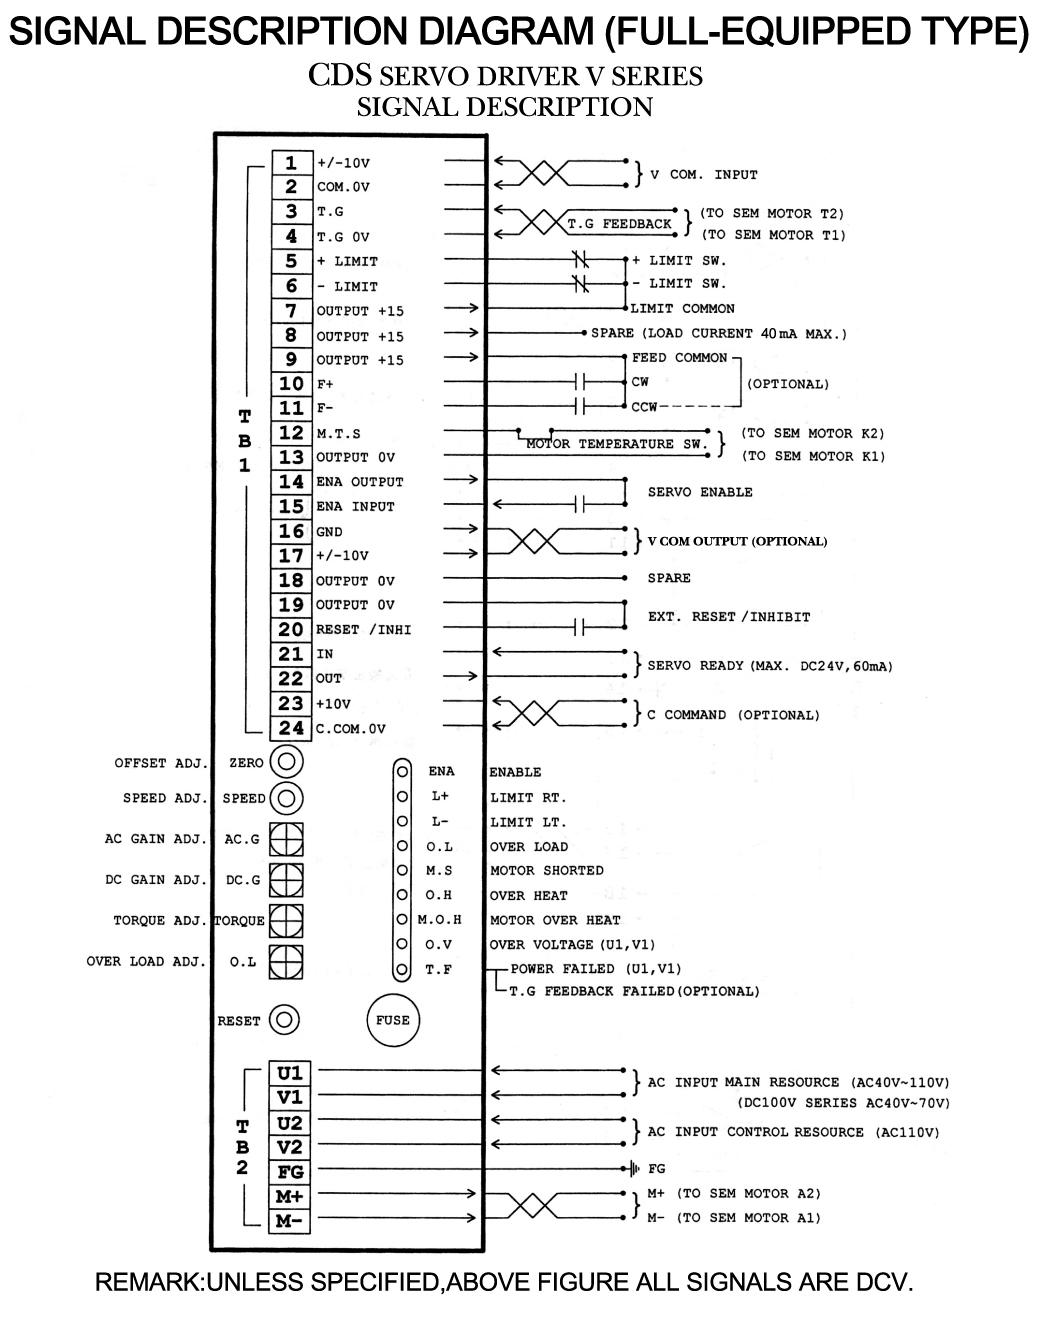 CDSservodriveconnections.jpg